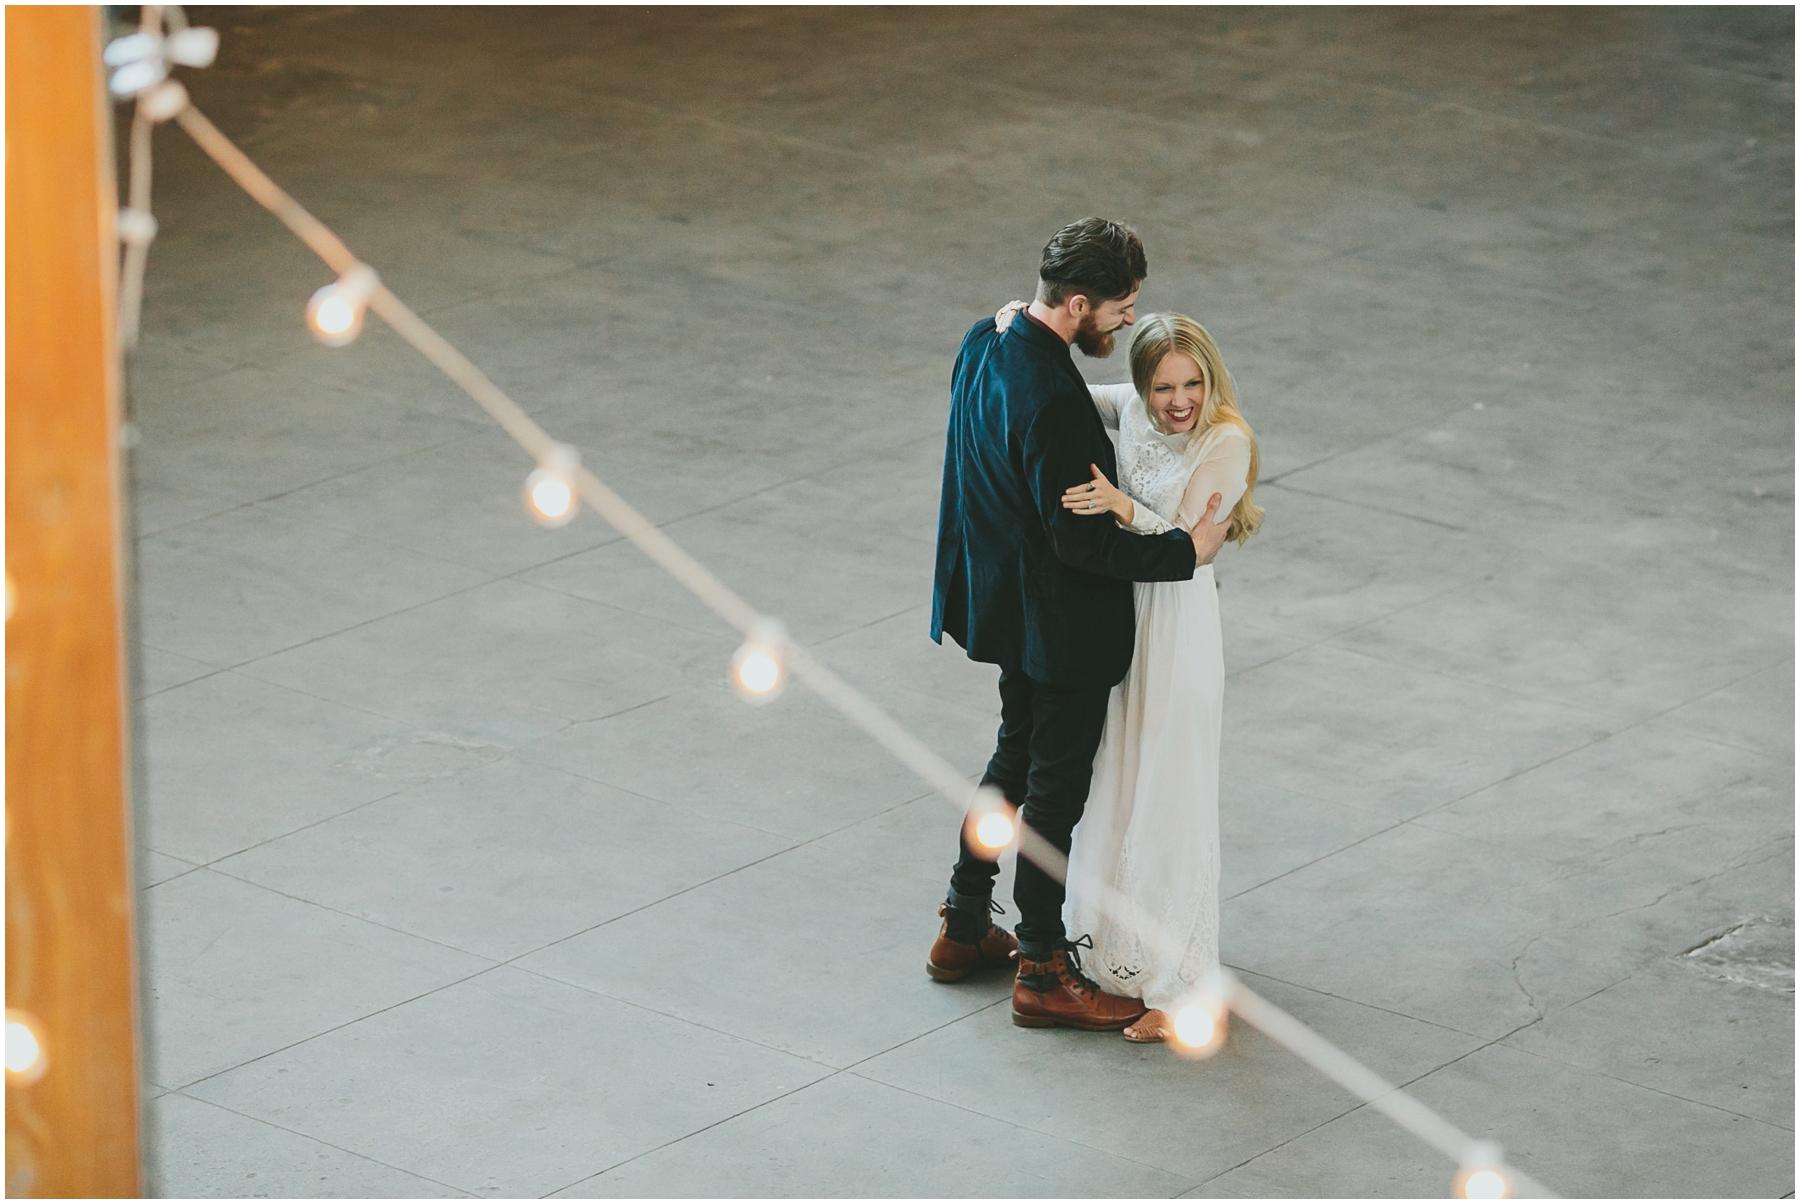 Natalie+Corey-WEDDING_KELLYBOITANO_0102